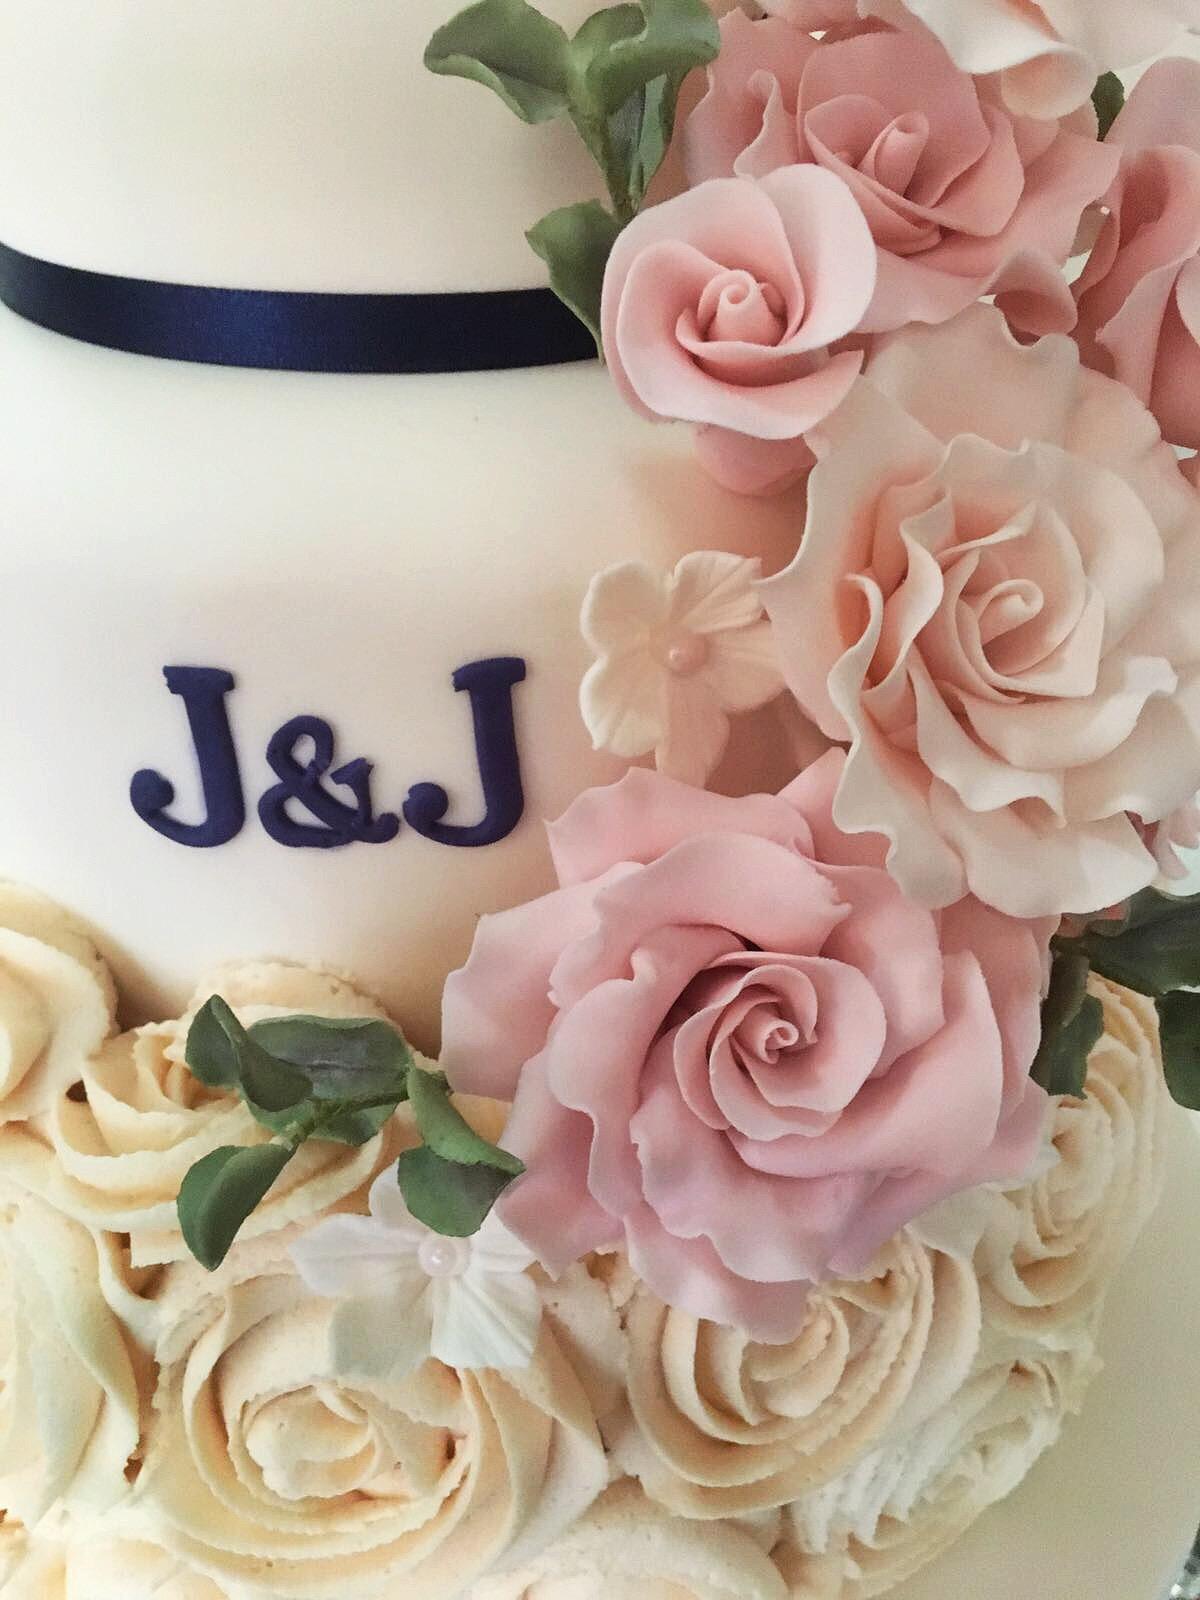 WEDDING CAKES | Iced and Spliced